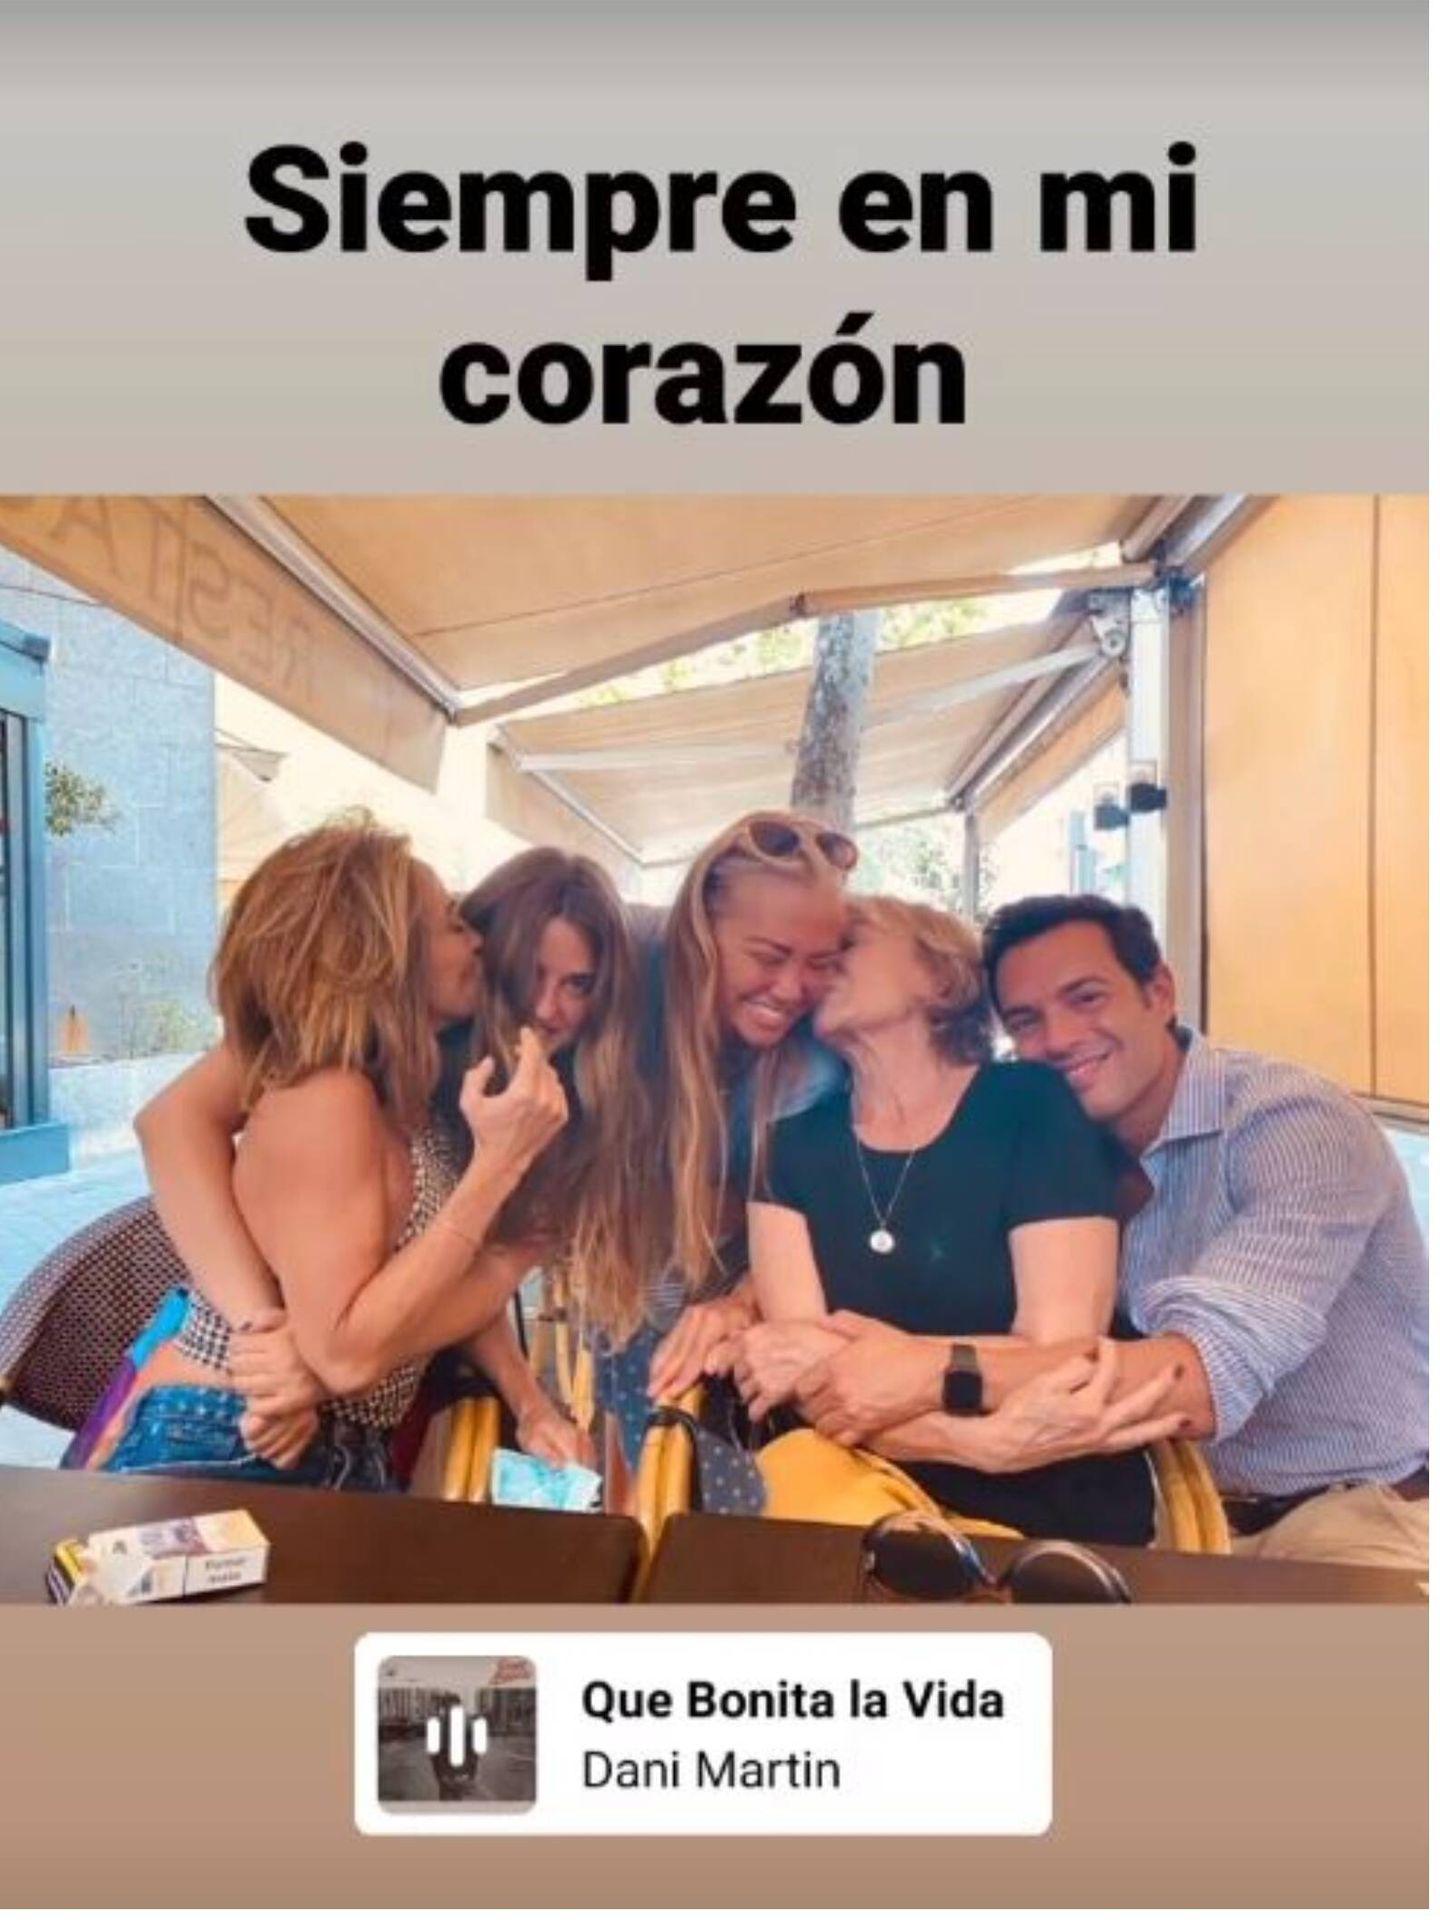 Belén Esteban recuerda a Mila Ximénez con esta imagen. (Instagram @belenestebanmenendez)